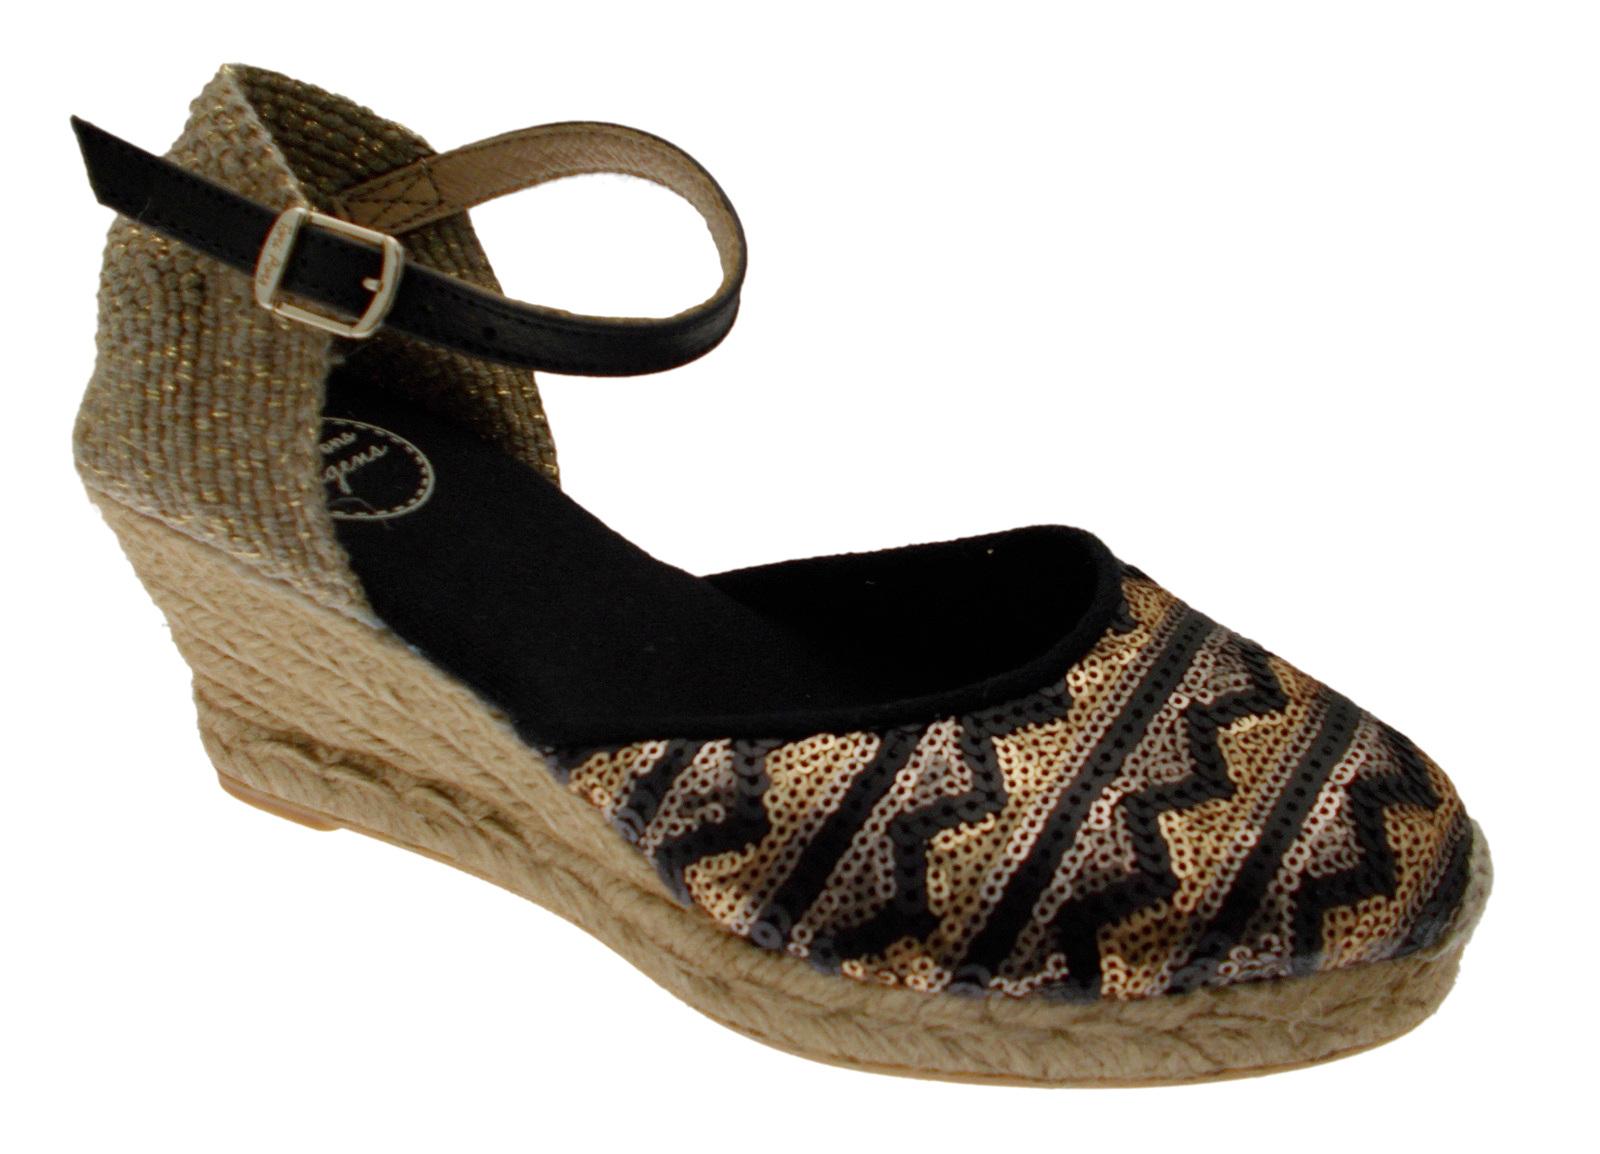 c6026ea886b Image is loading CORFU-5LJ-black-shoe-fantasy-sandal-rope-espadrilles-